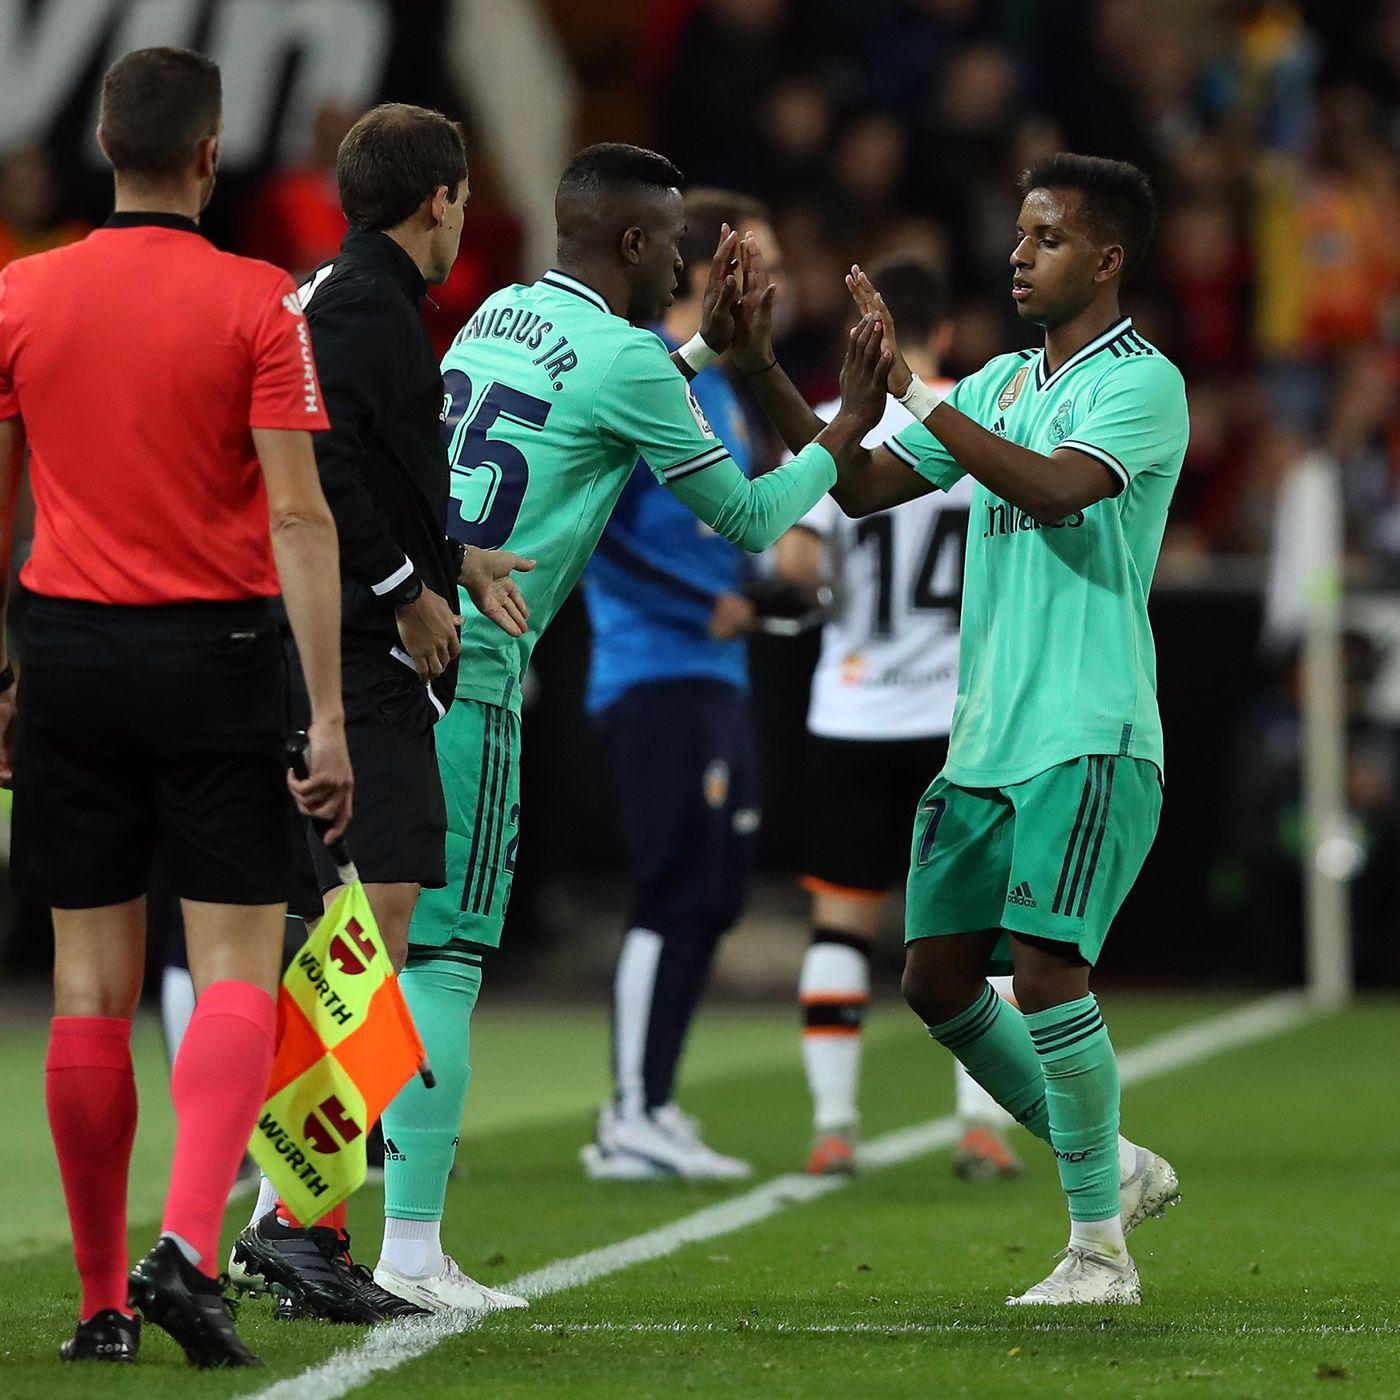 Real Sociedad Vs Real Madrid La Liga Predicted Lineups Managing Madrid